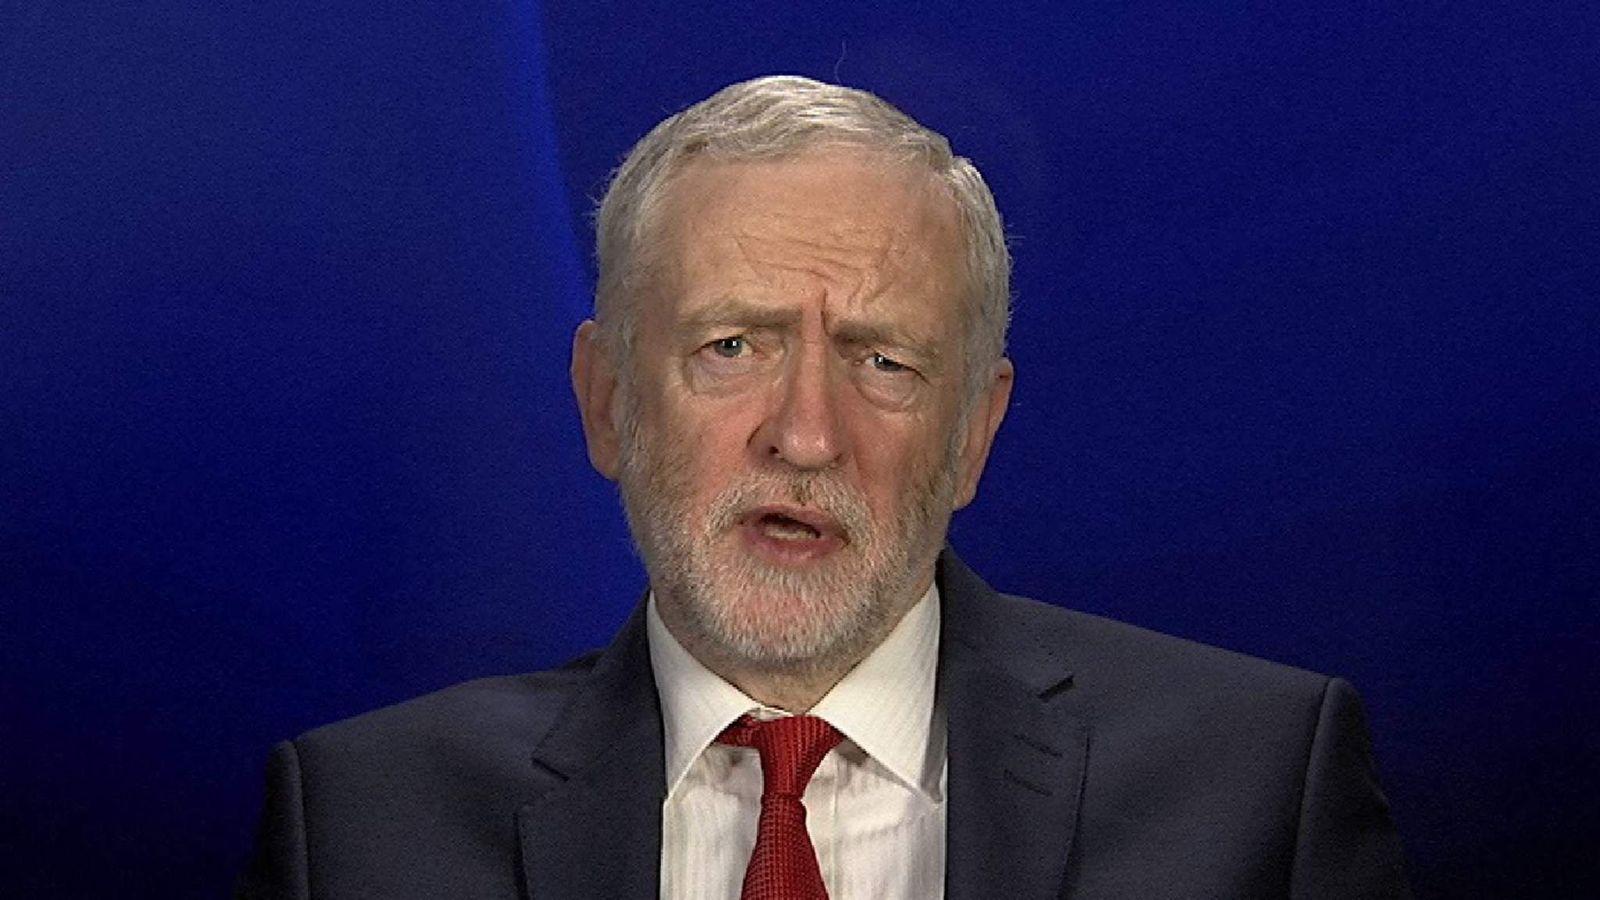 Jeremy Corbyn's Response To Ian Duncan Smith's Resignation